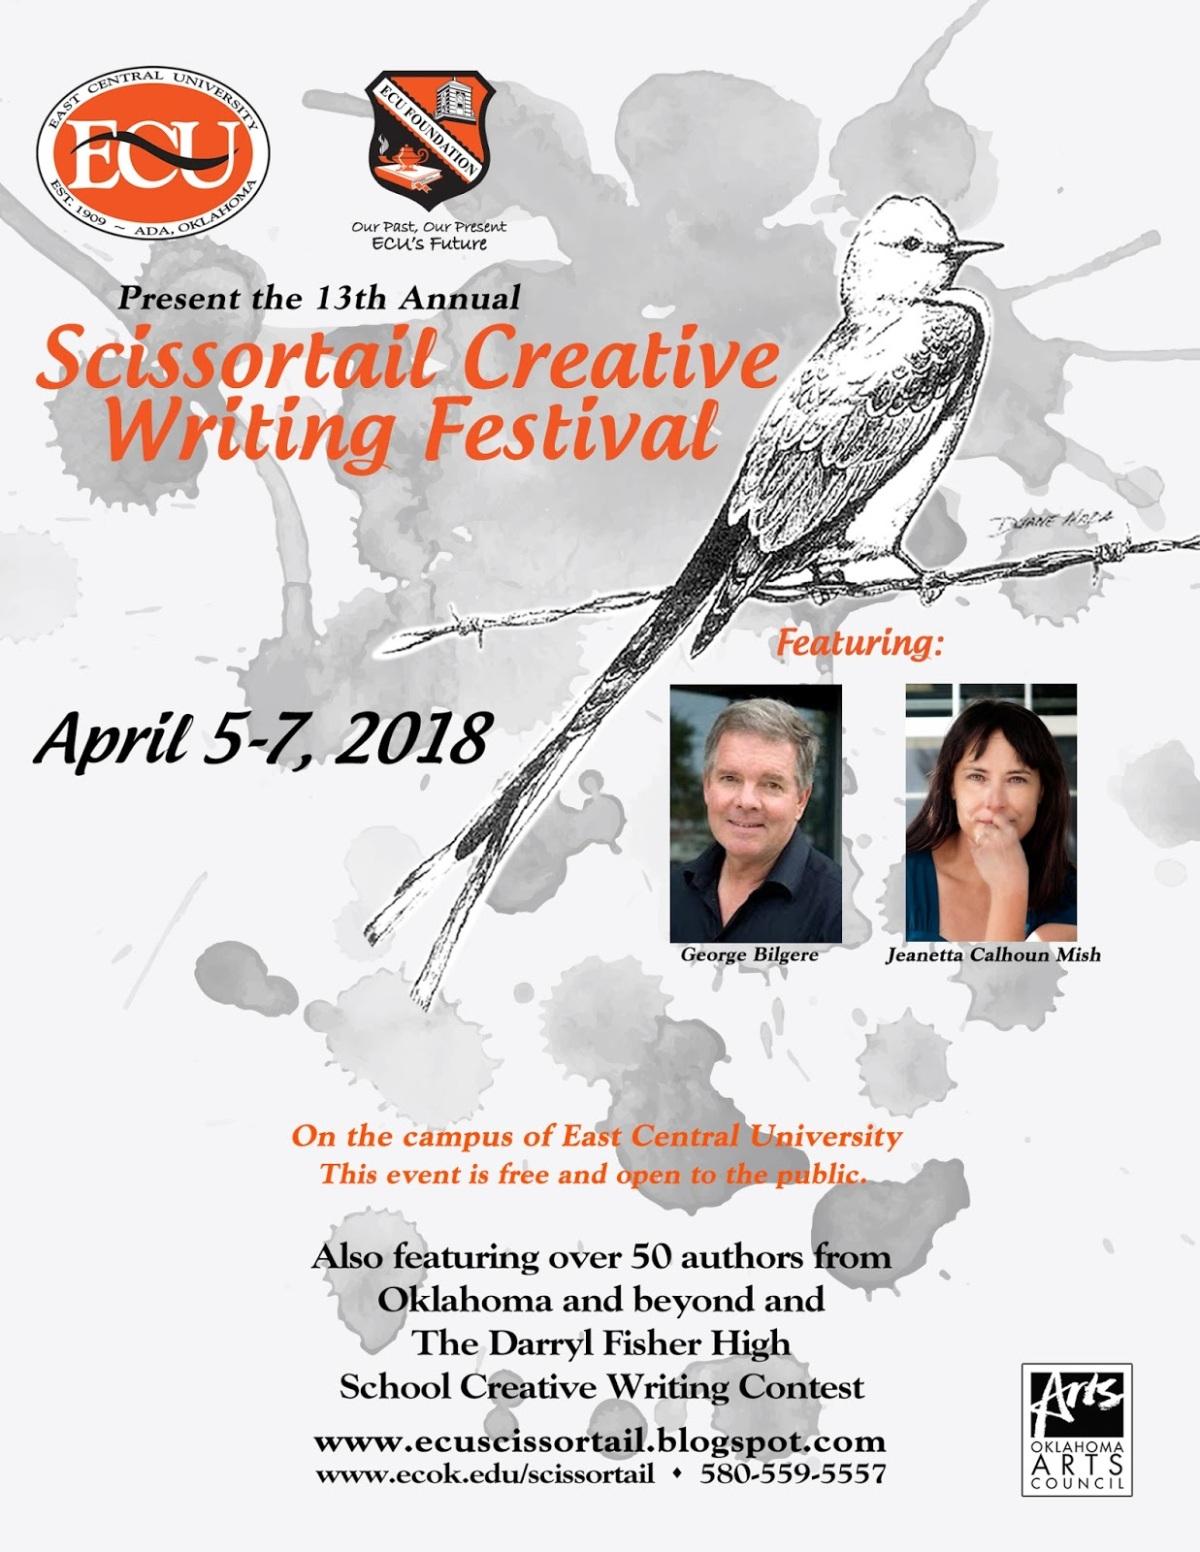 OBU students to attend writingfestival